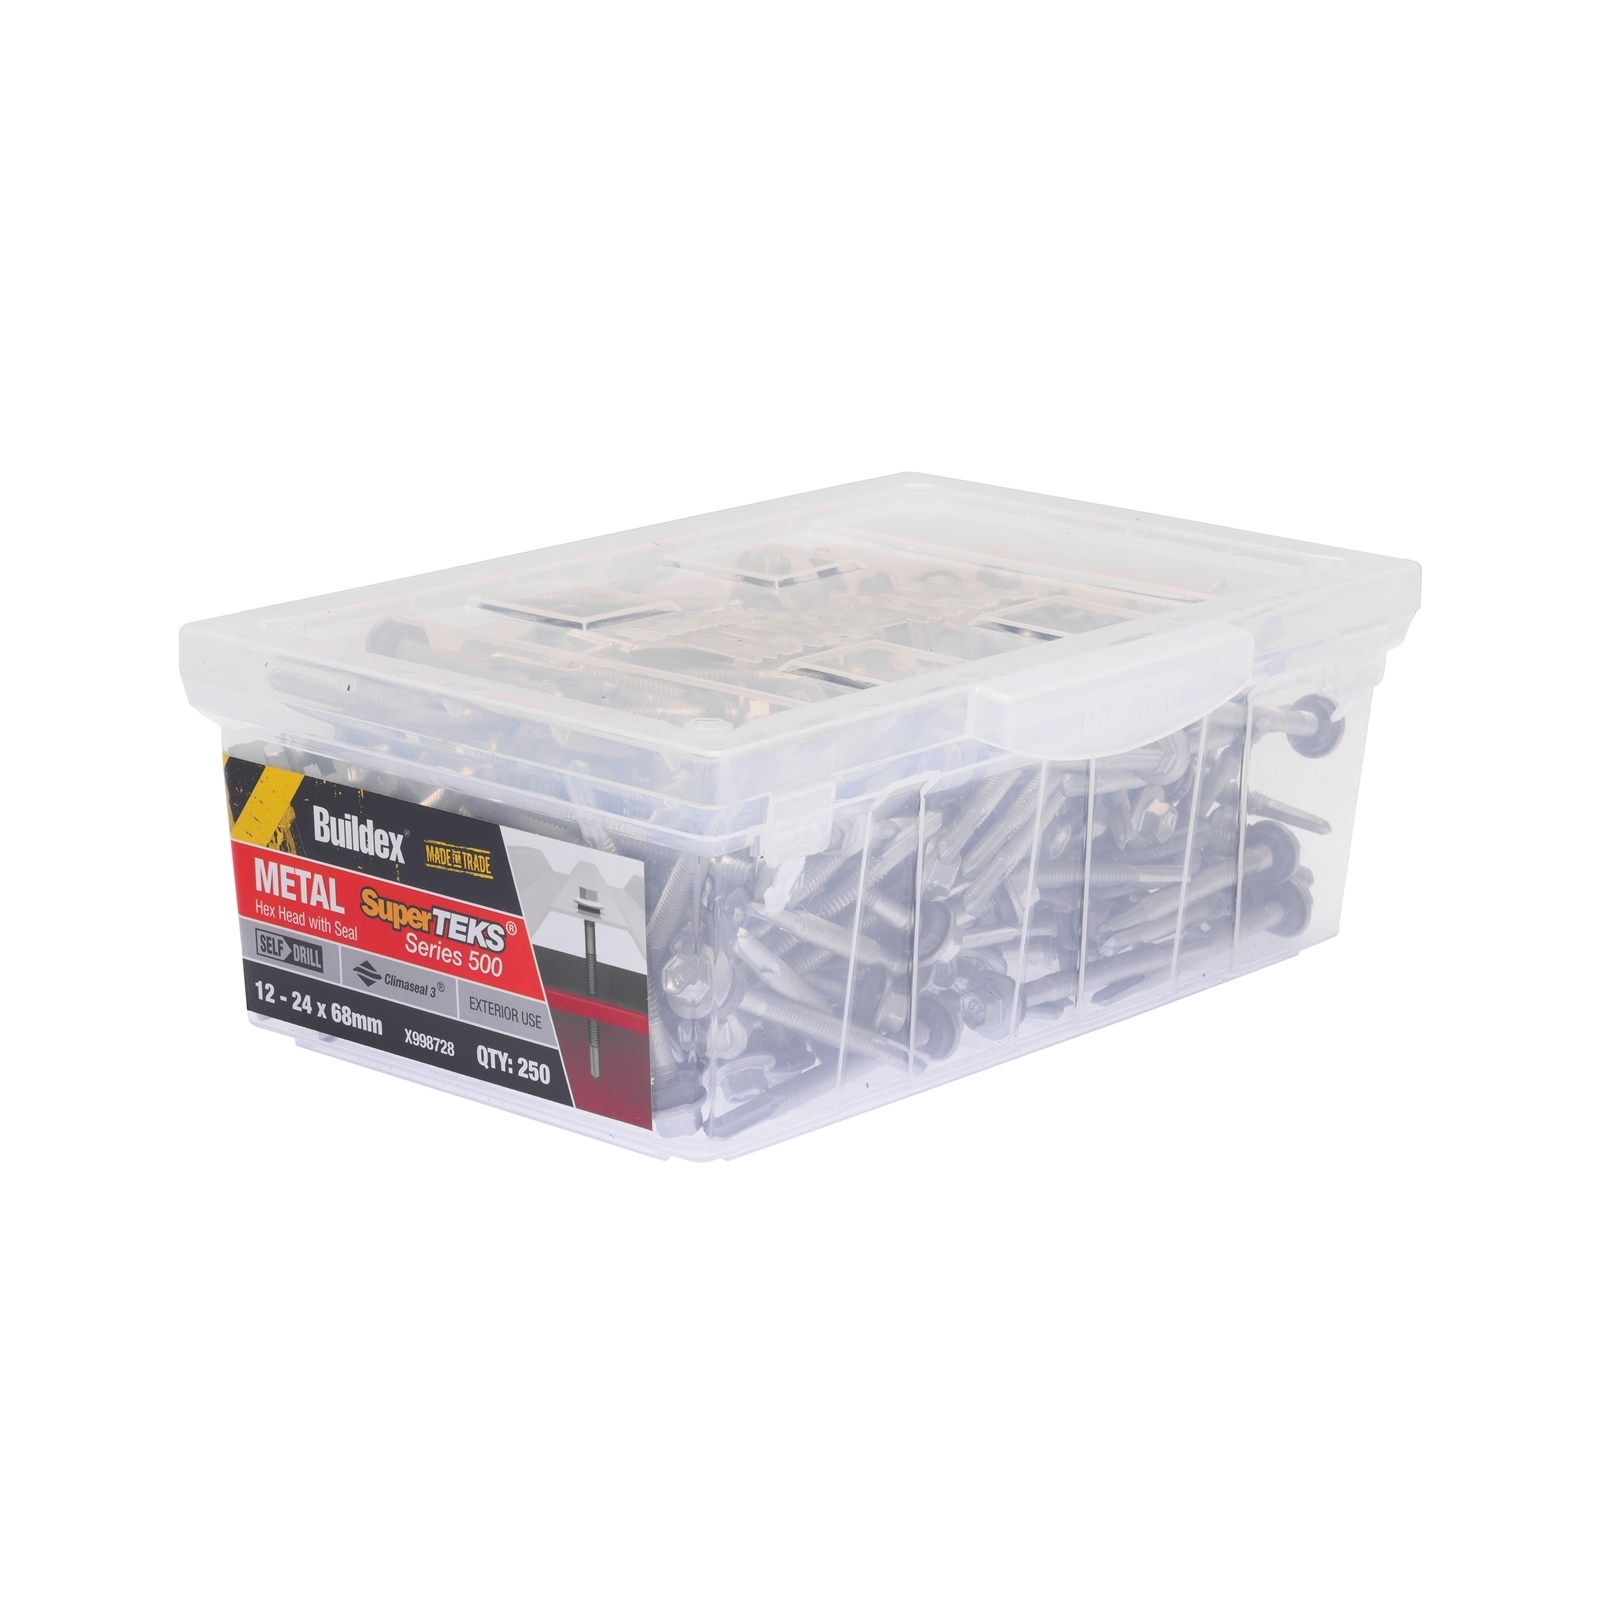 Buildex 12 - 24 x 68mm SuperTEKS Series 500 Hex Head Metal Screw - 250 Box